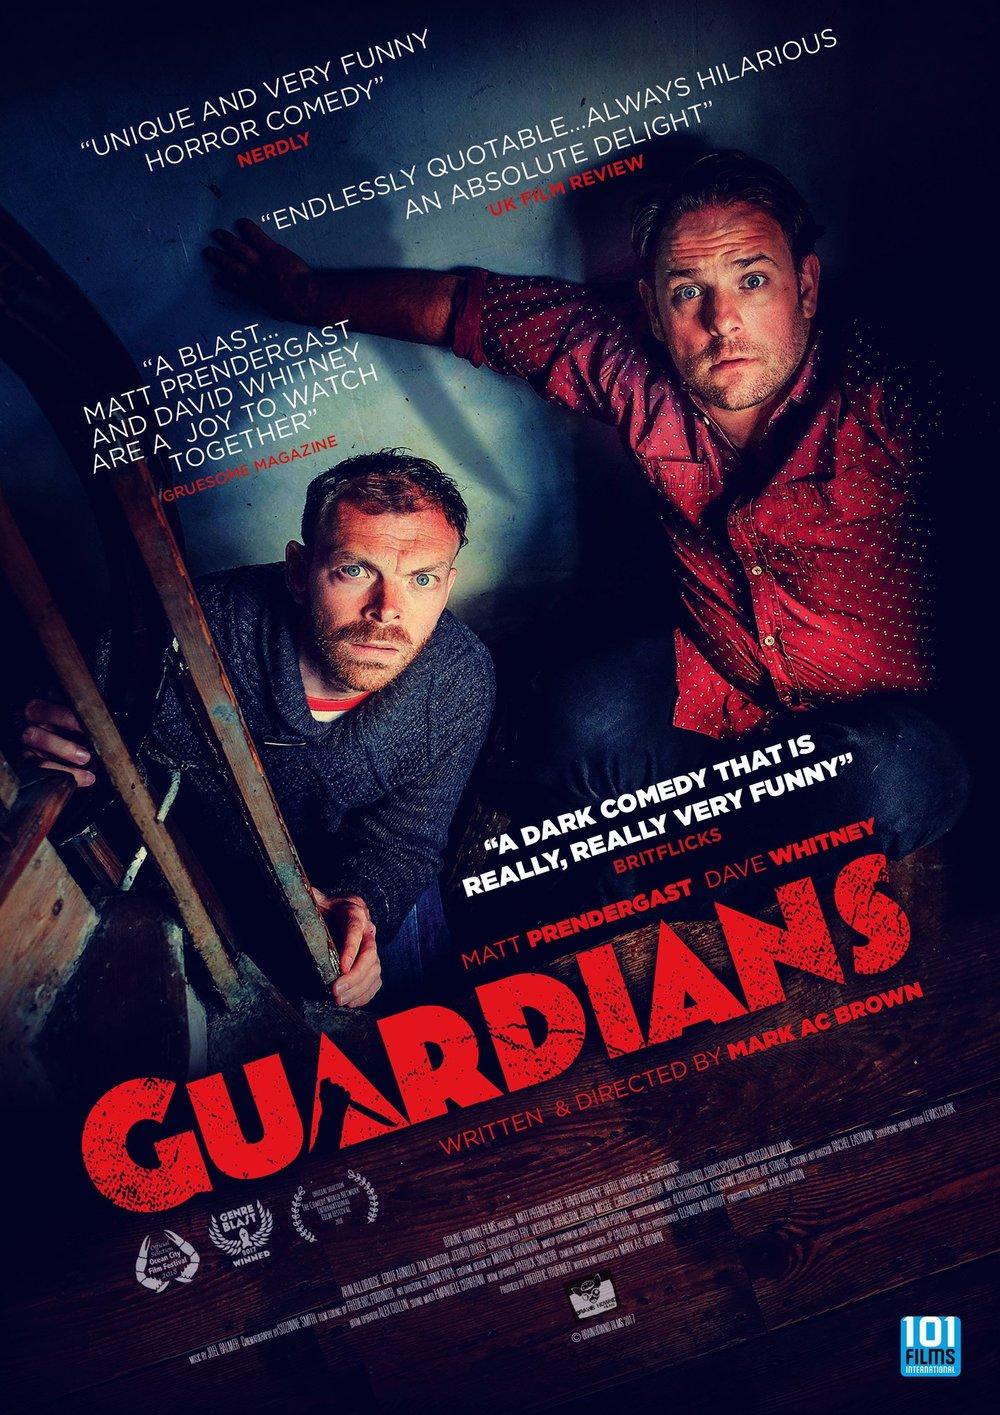 guardians_poster_web_1024x1024@2x.jpg